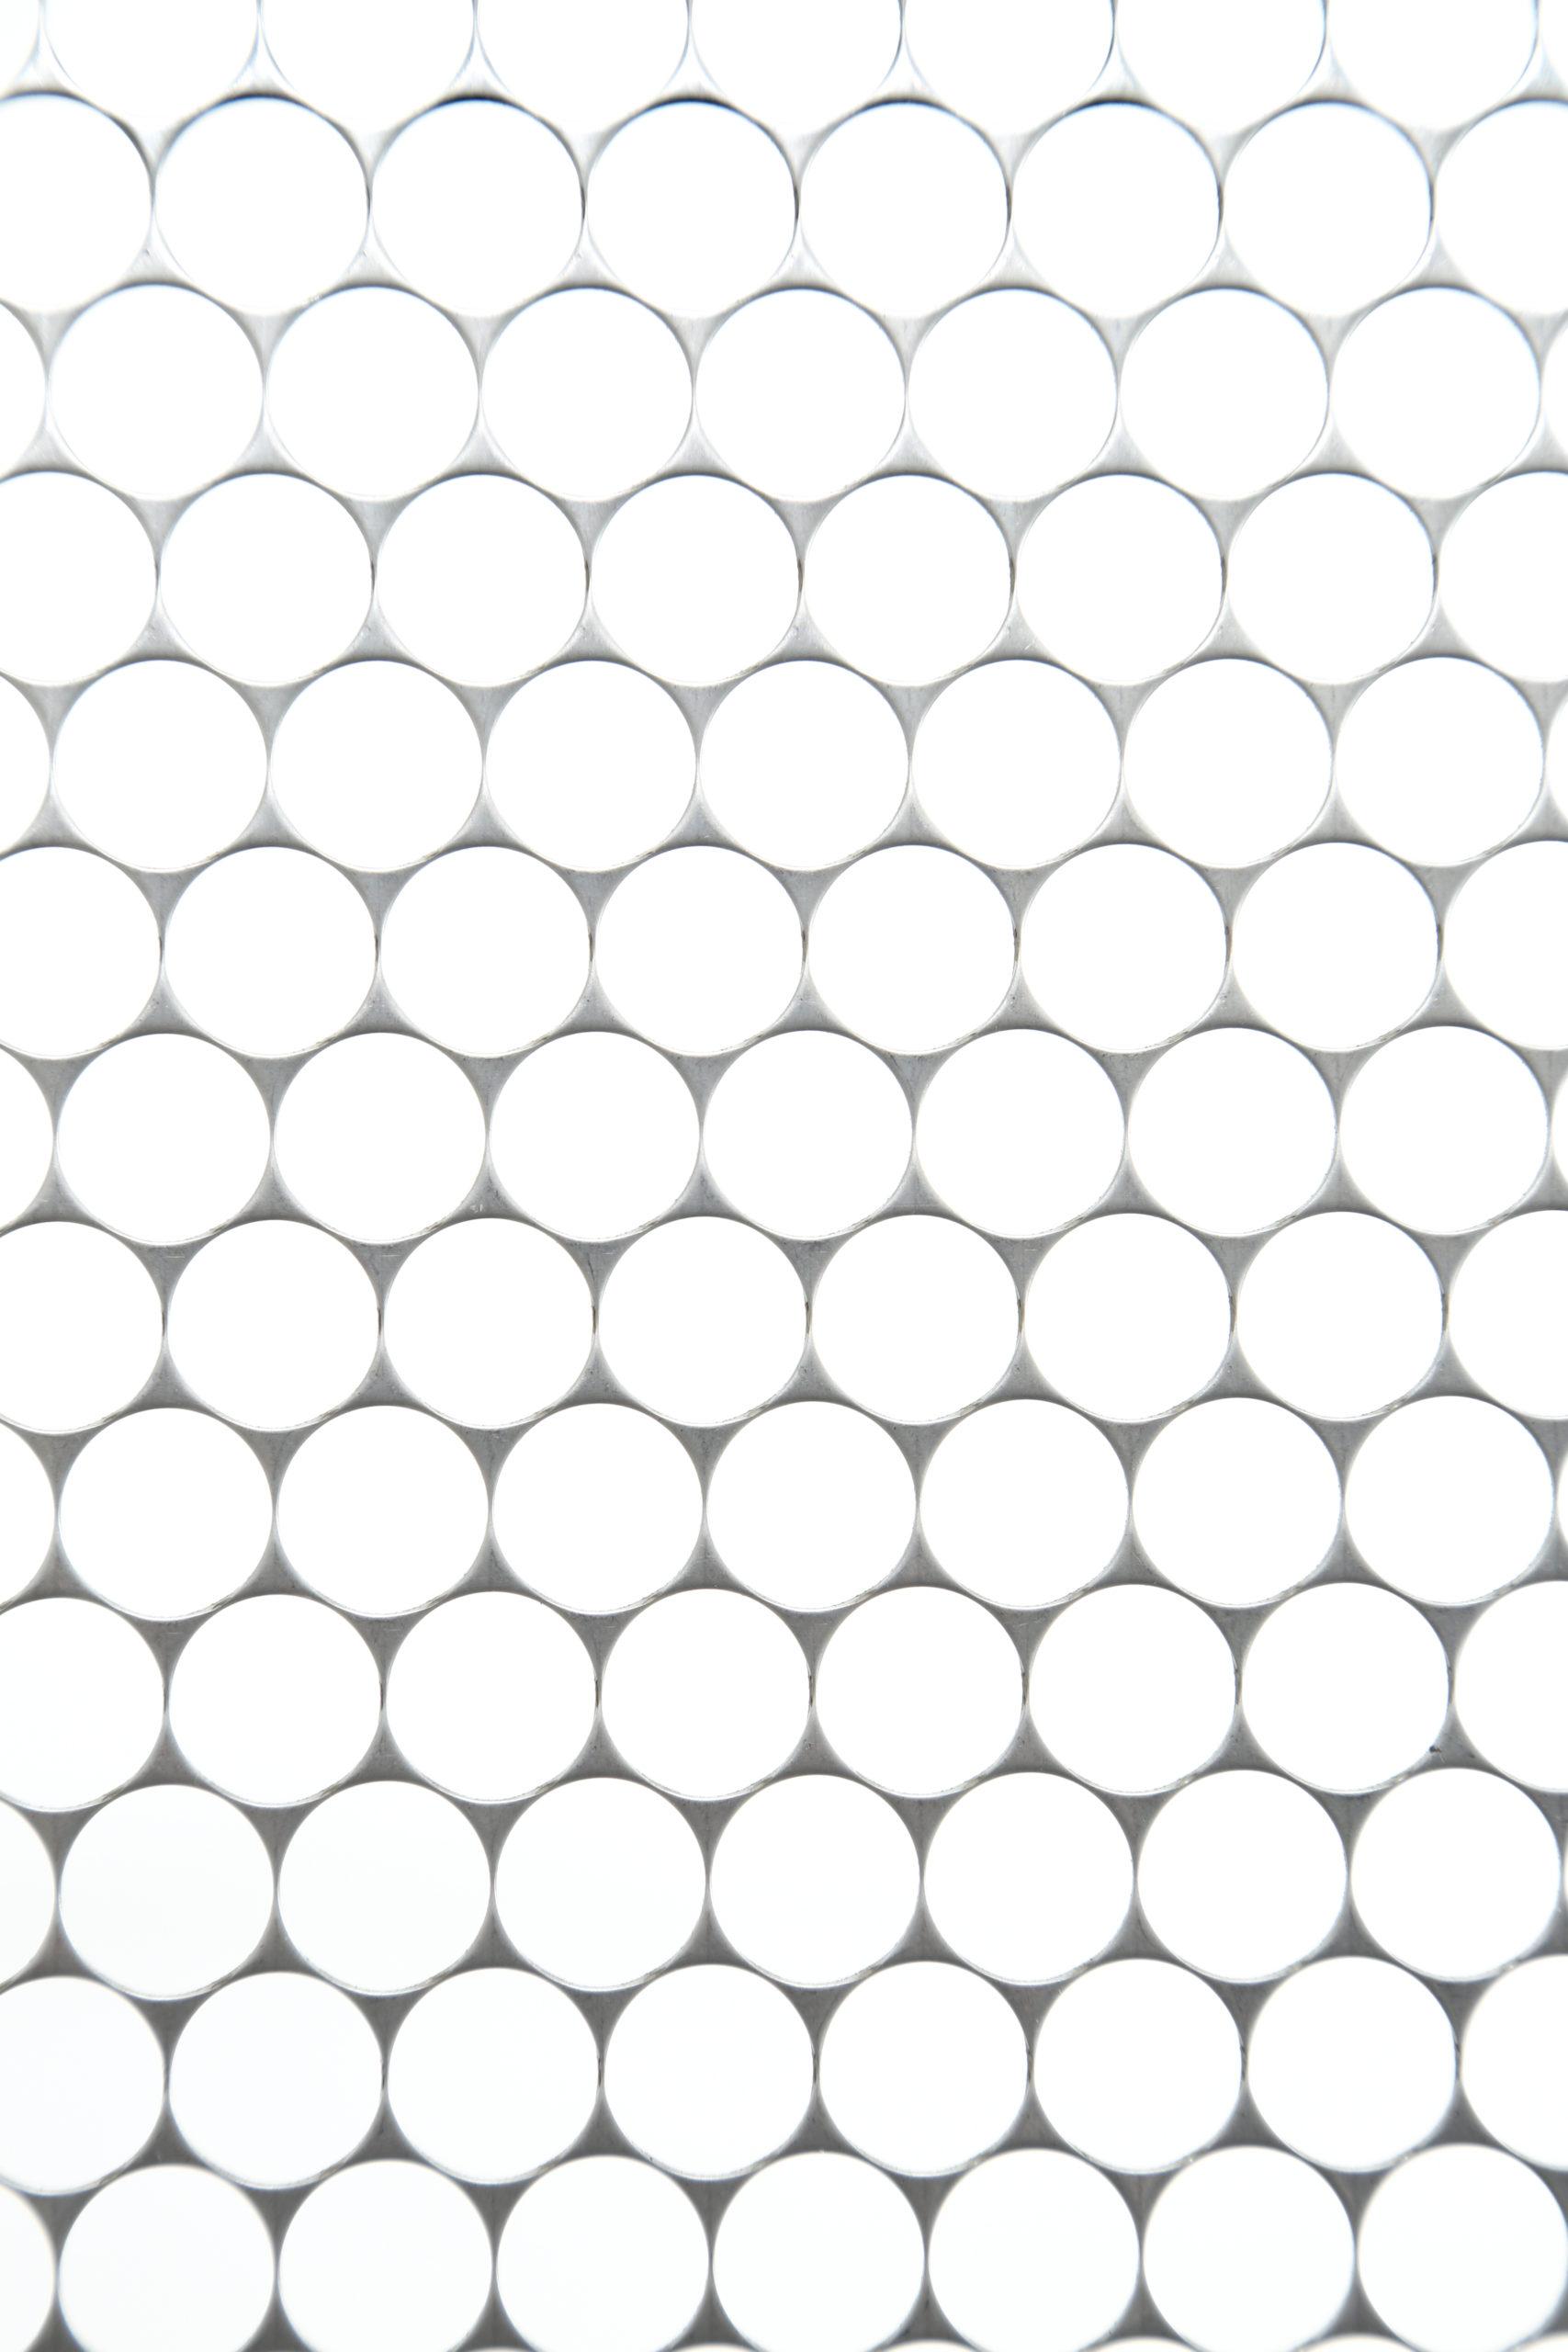 SUS 304-2B t1.0 丸孔 D15×P15.5 60°チドリ 開口率:84.8%